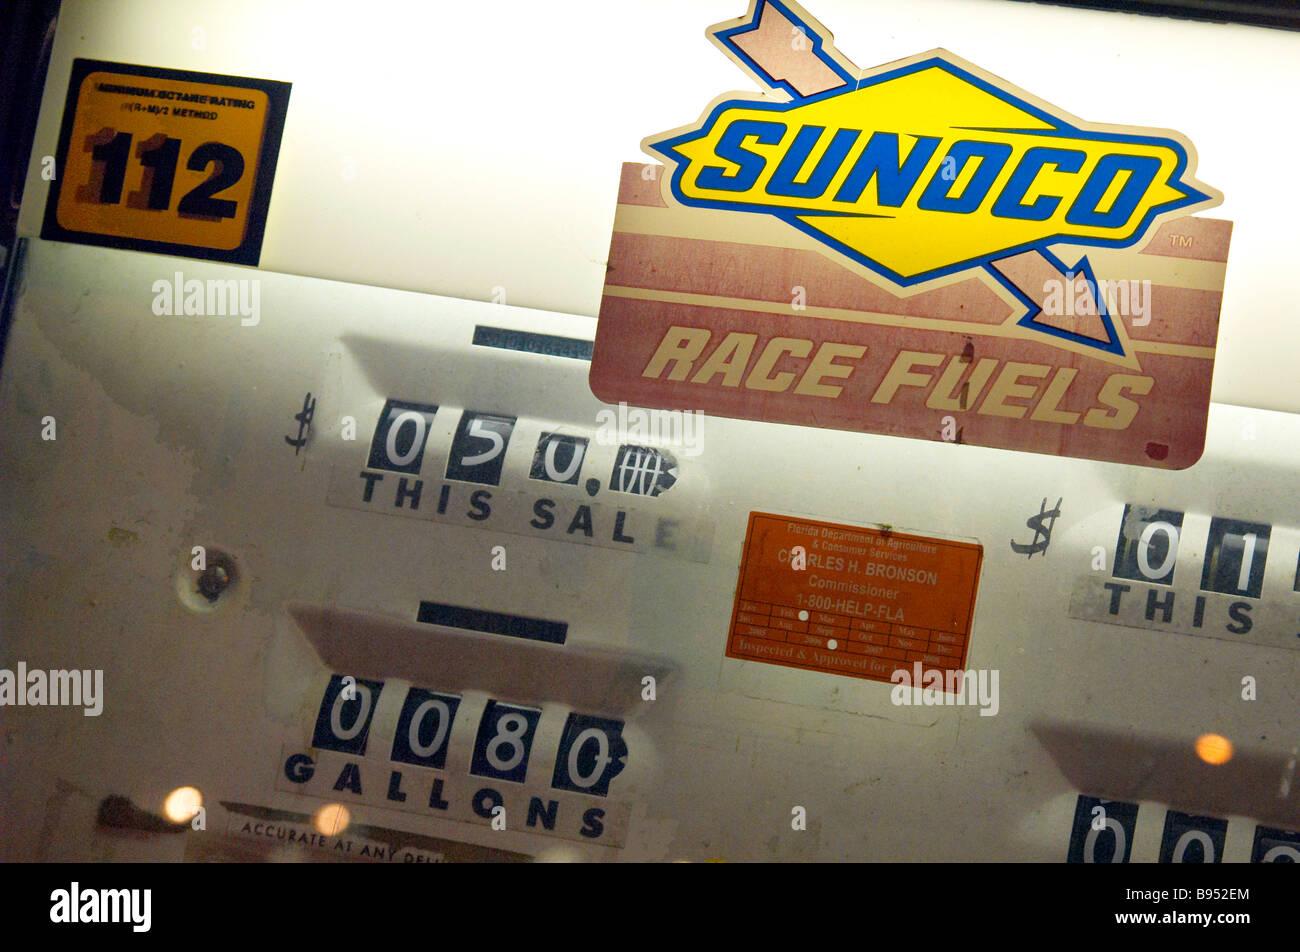 Sunoco Stock Photos & Sunoco Stock Images - Alamy